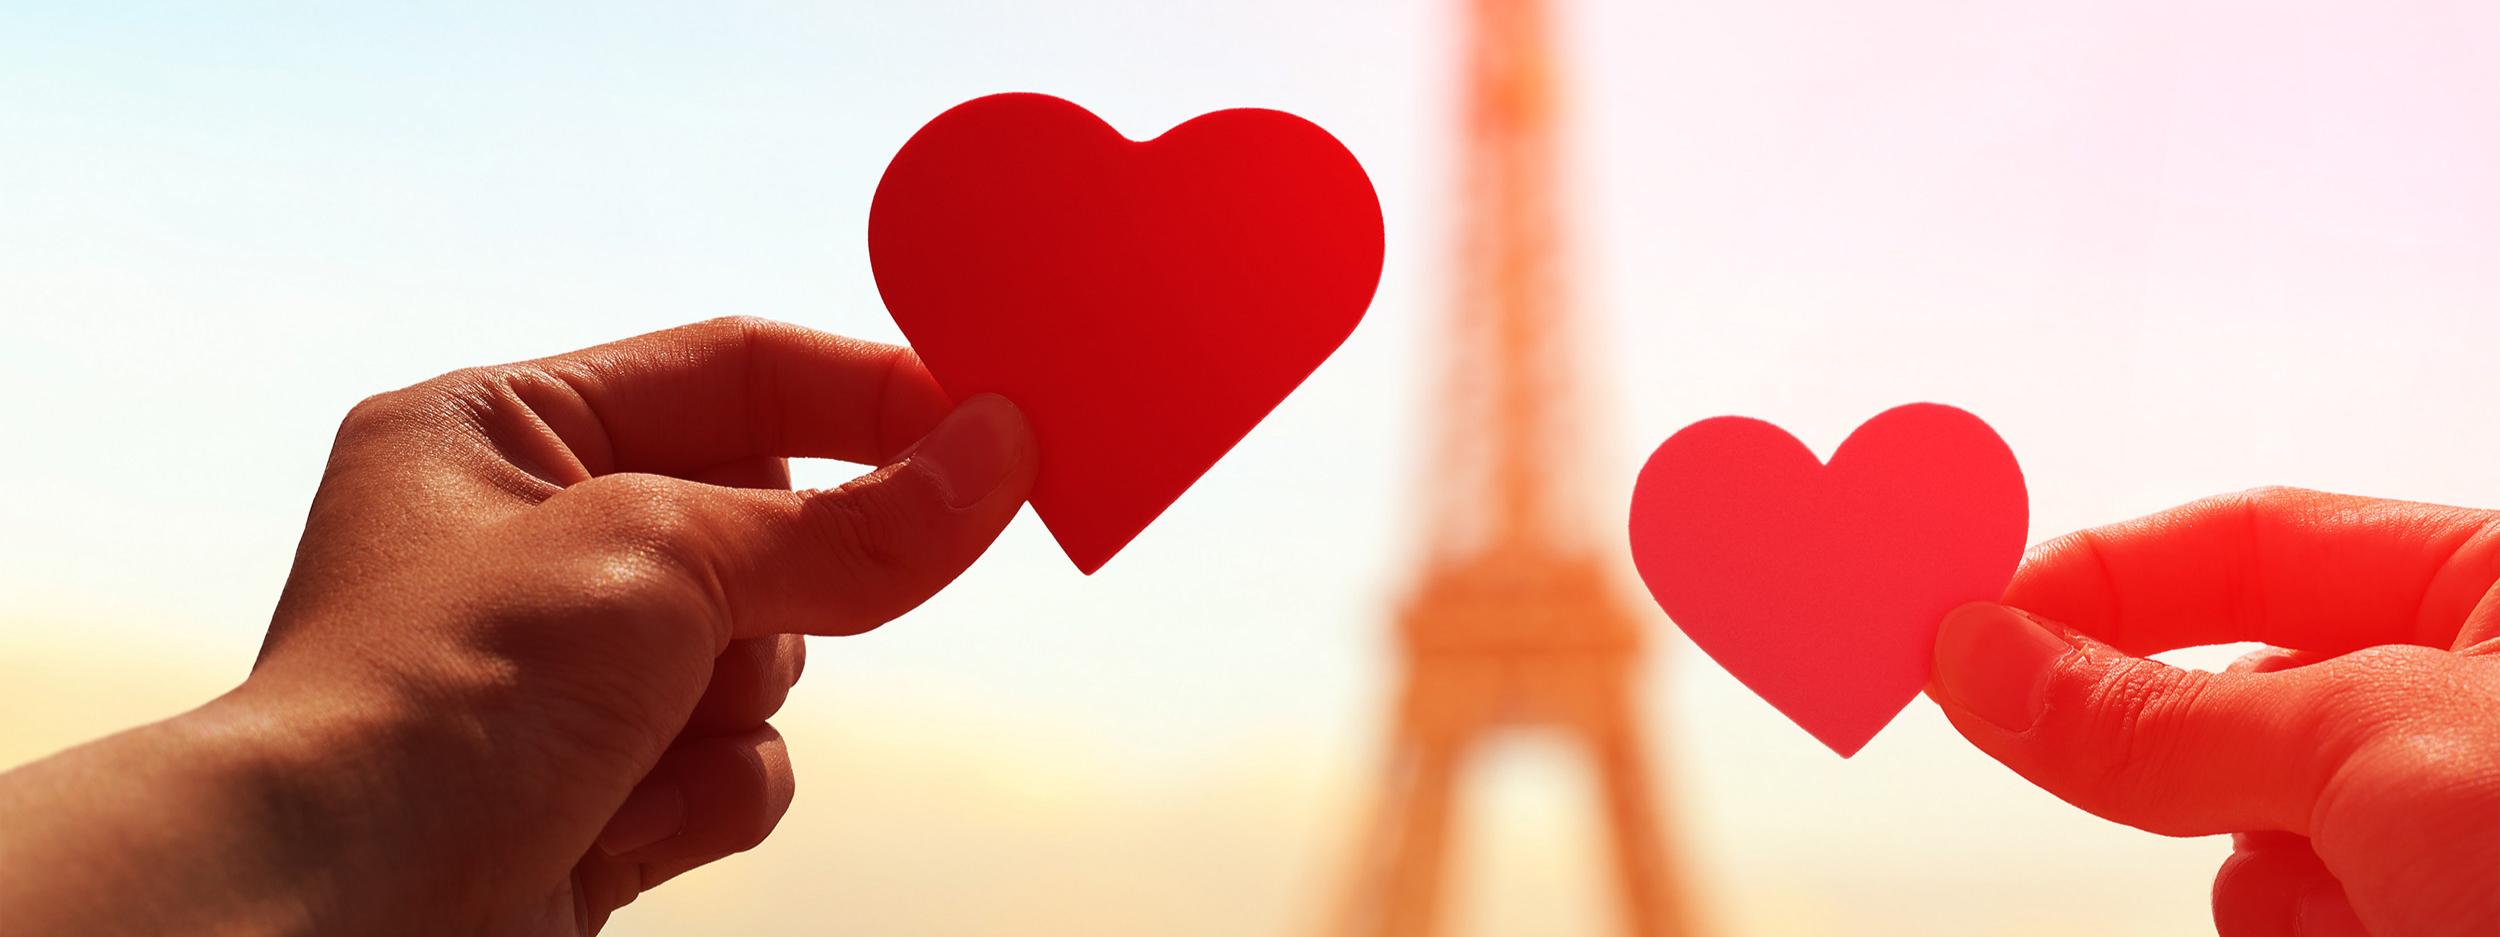 Romance in Paris Eiffel Tower